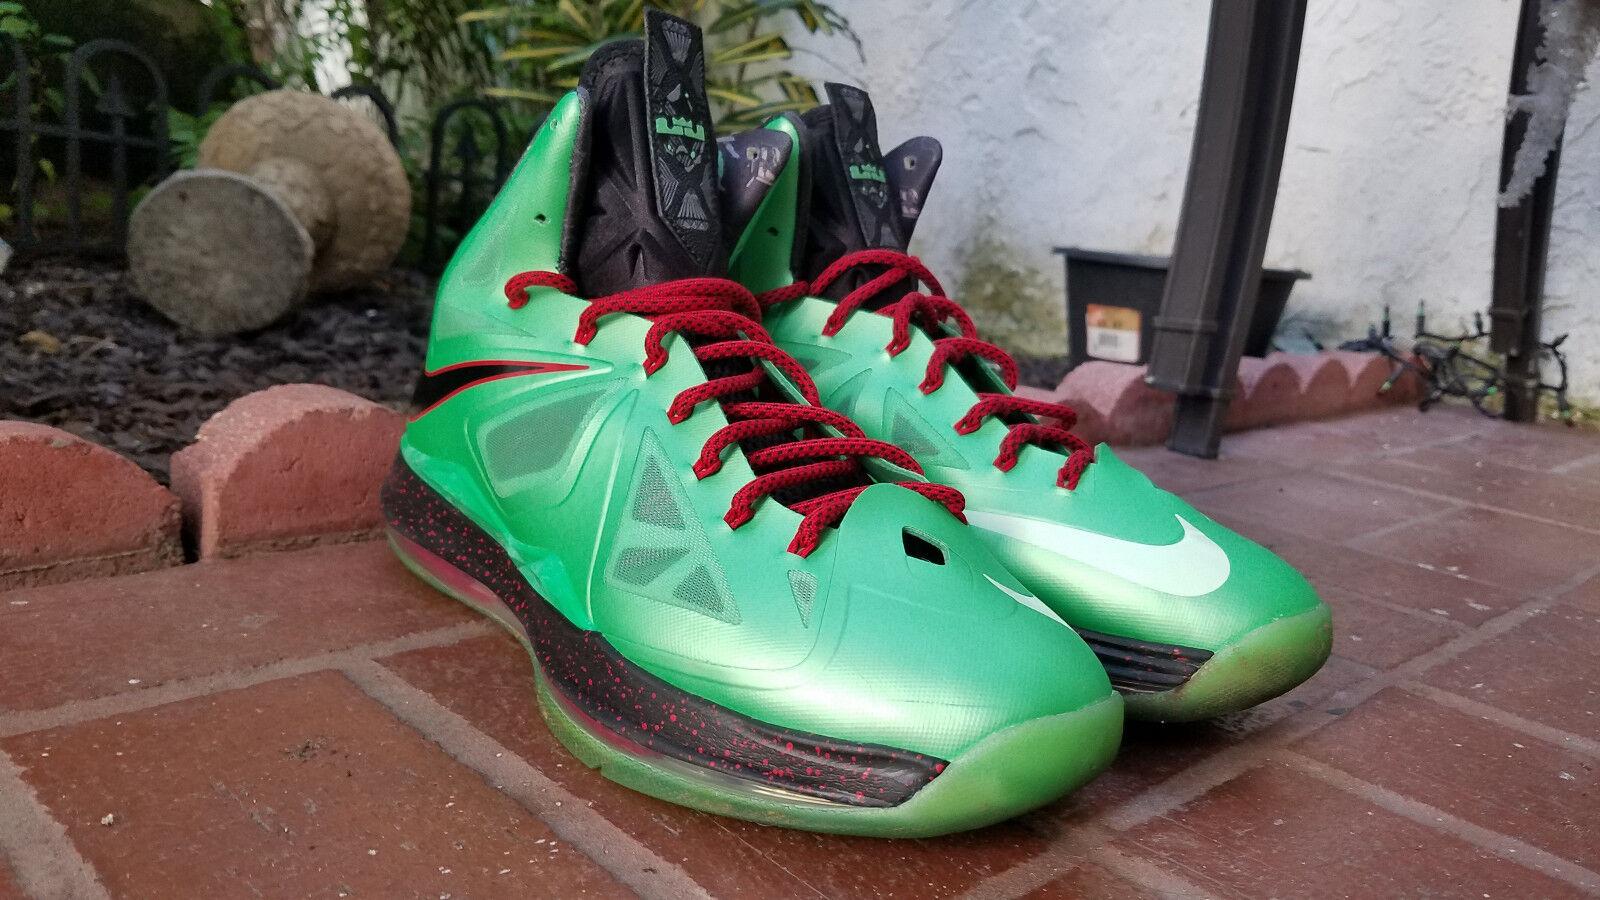 Mens Nike Lebron X 10 Cutting jade shoe OG PE rare 541100 303 green red black